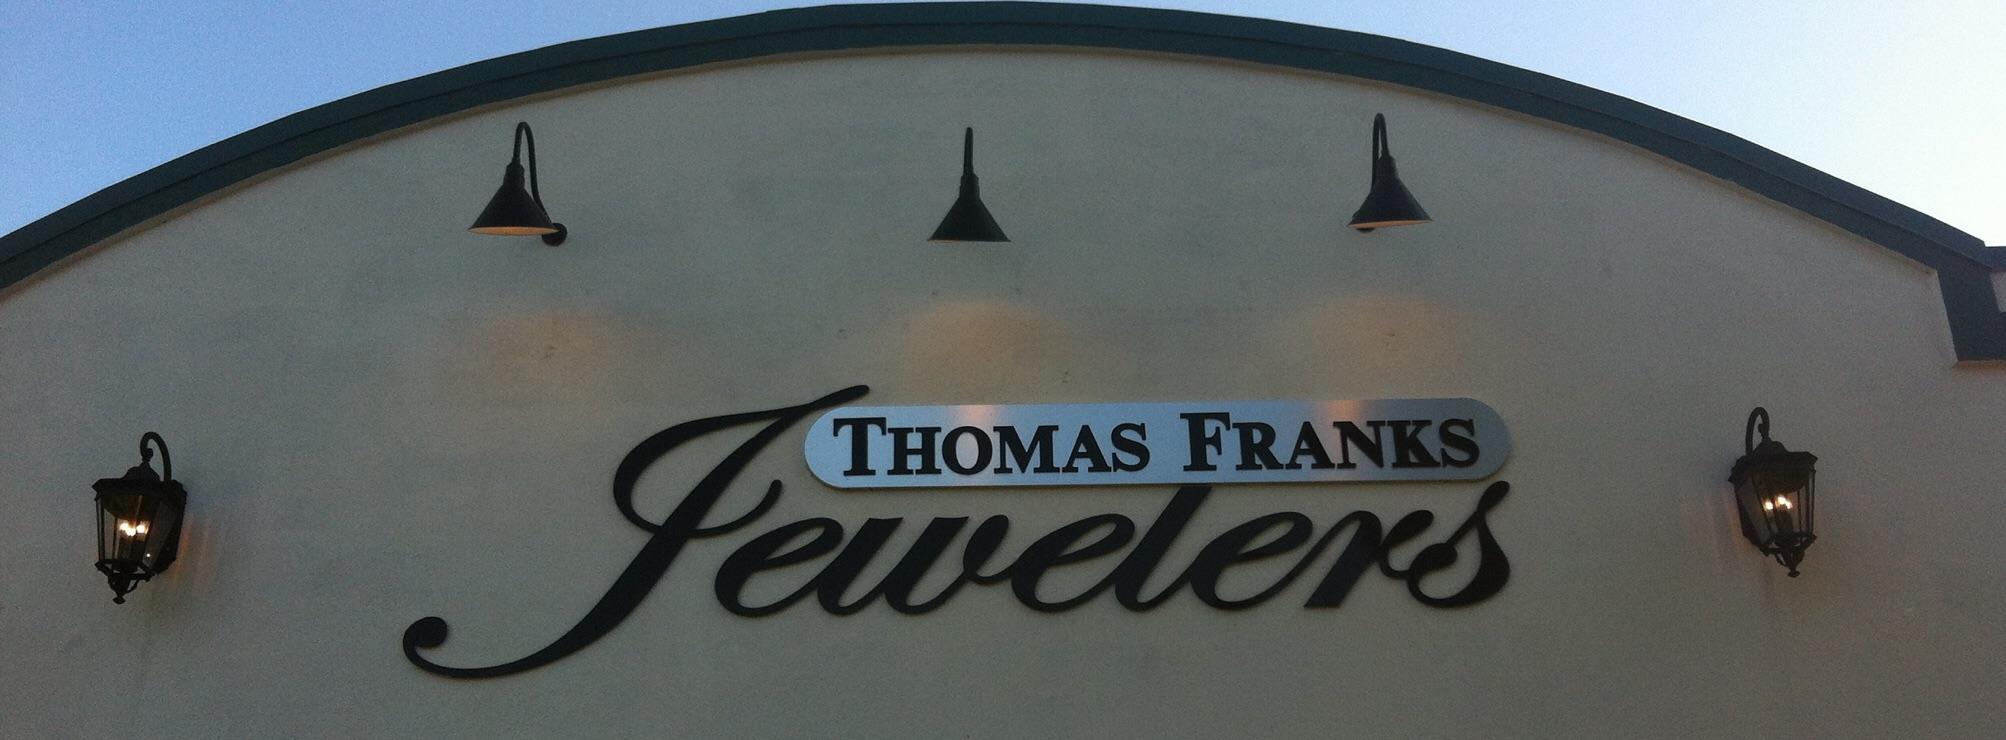 Thomas Franks Jewelers image 5